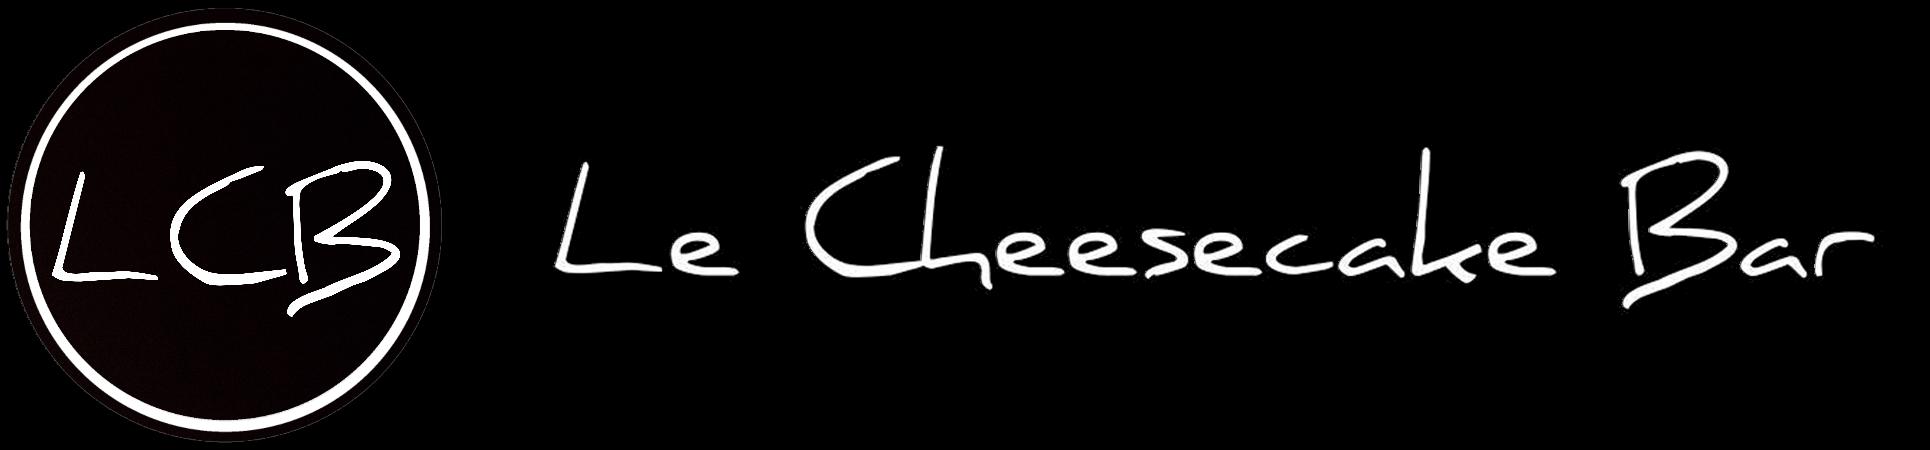 Le Cheesecake Bar Gatineau